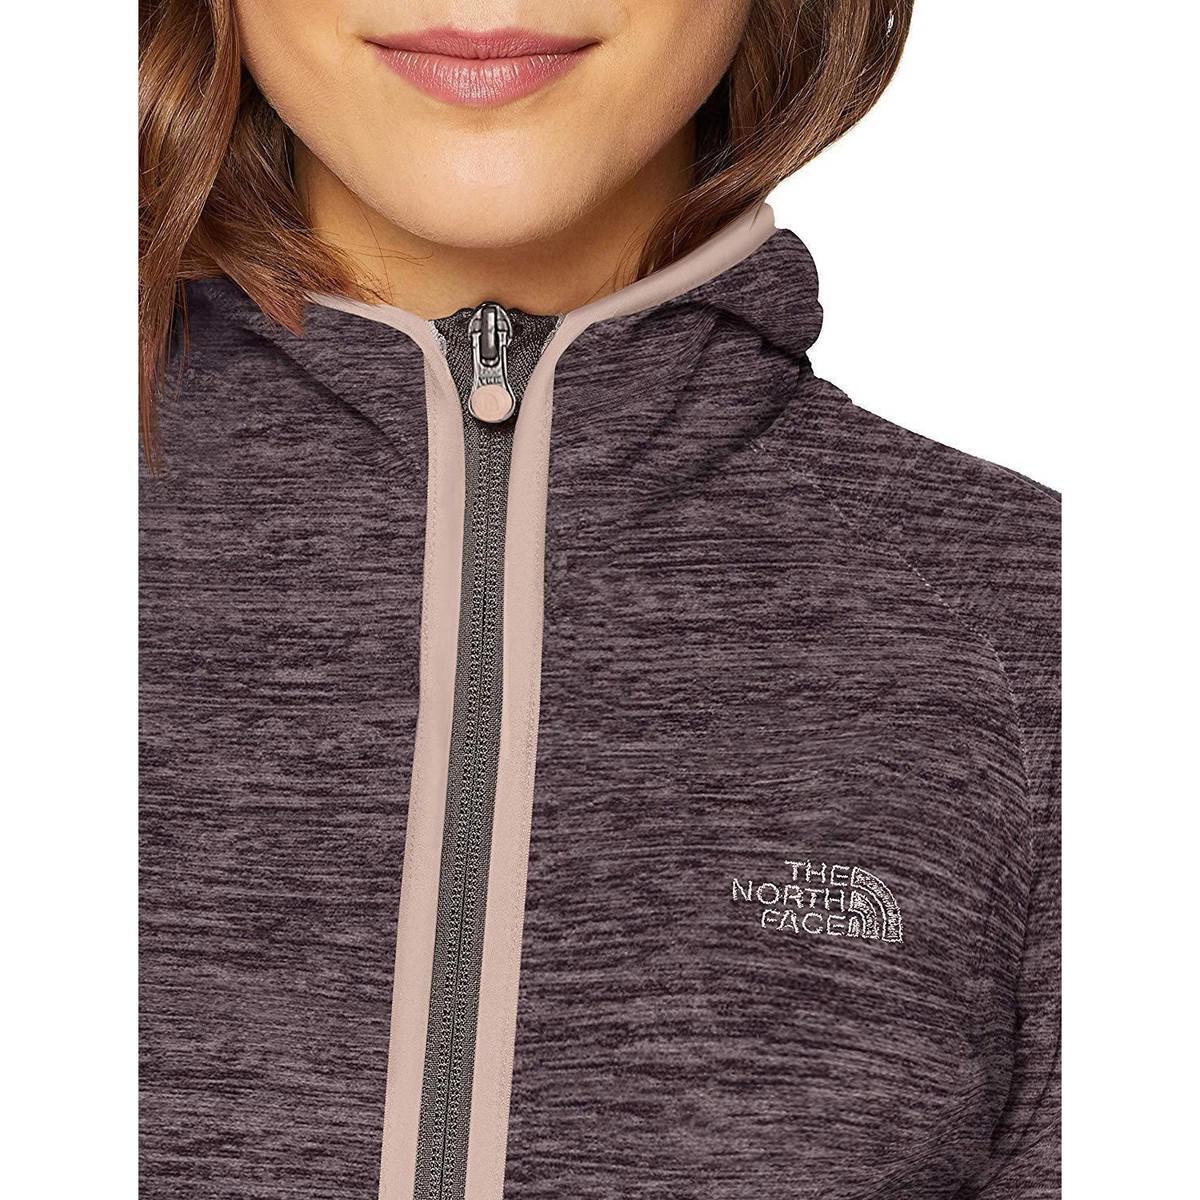 4c7ae6dc The North Face Gray W Nikster Full Zip H Sudaderas 6klhsr Women's Fleece  Jacket In Grey